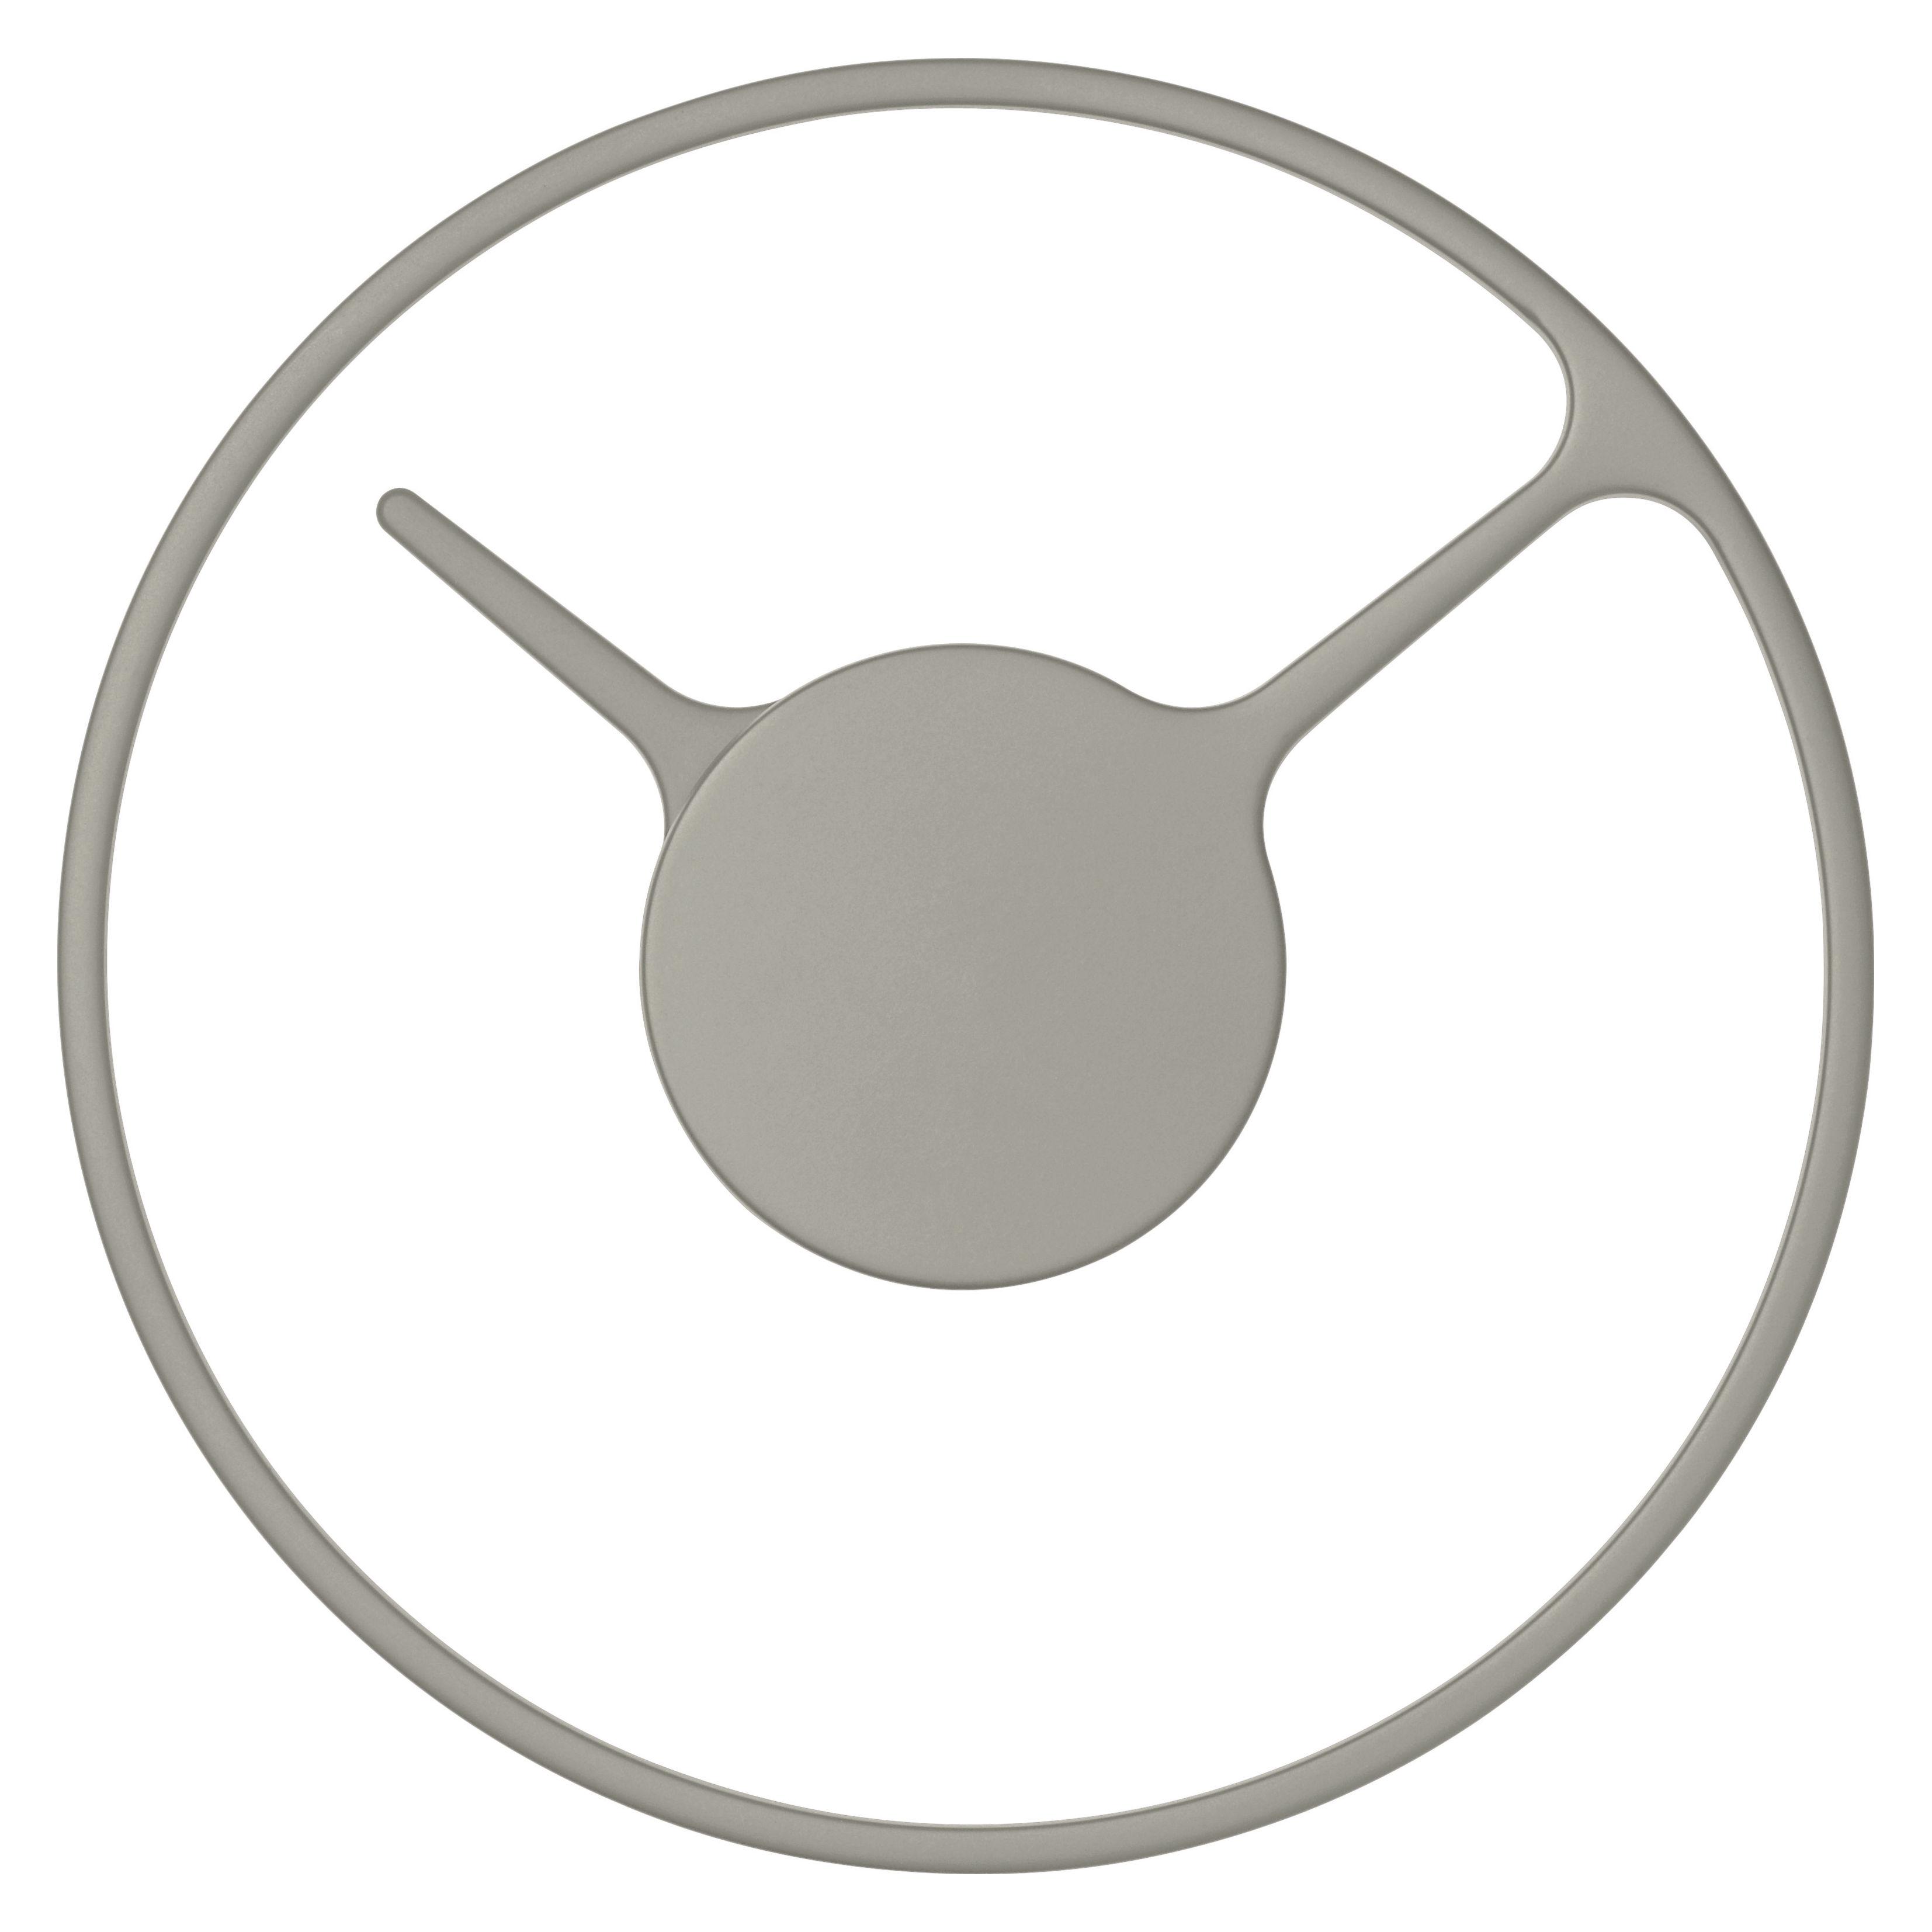 Dekoration - Uhren - Stelton Time Medium Wanduhr / Ø 22 cm - Stelton - Grau - Aluminium